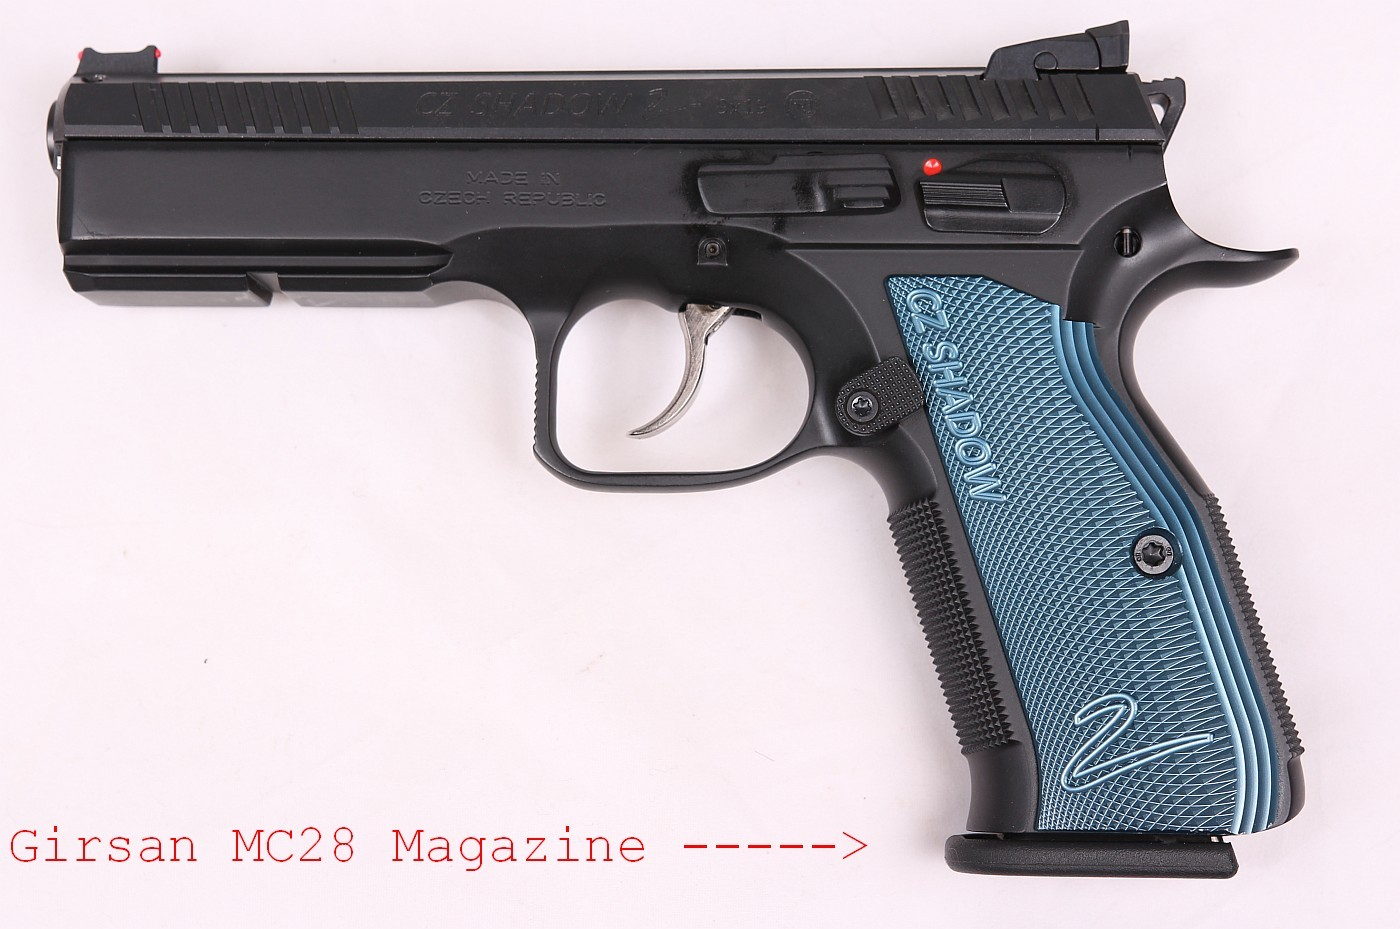 Girsan MC28SA Review   The Hunting Gear Guy